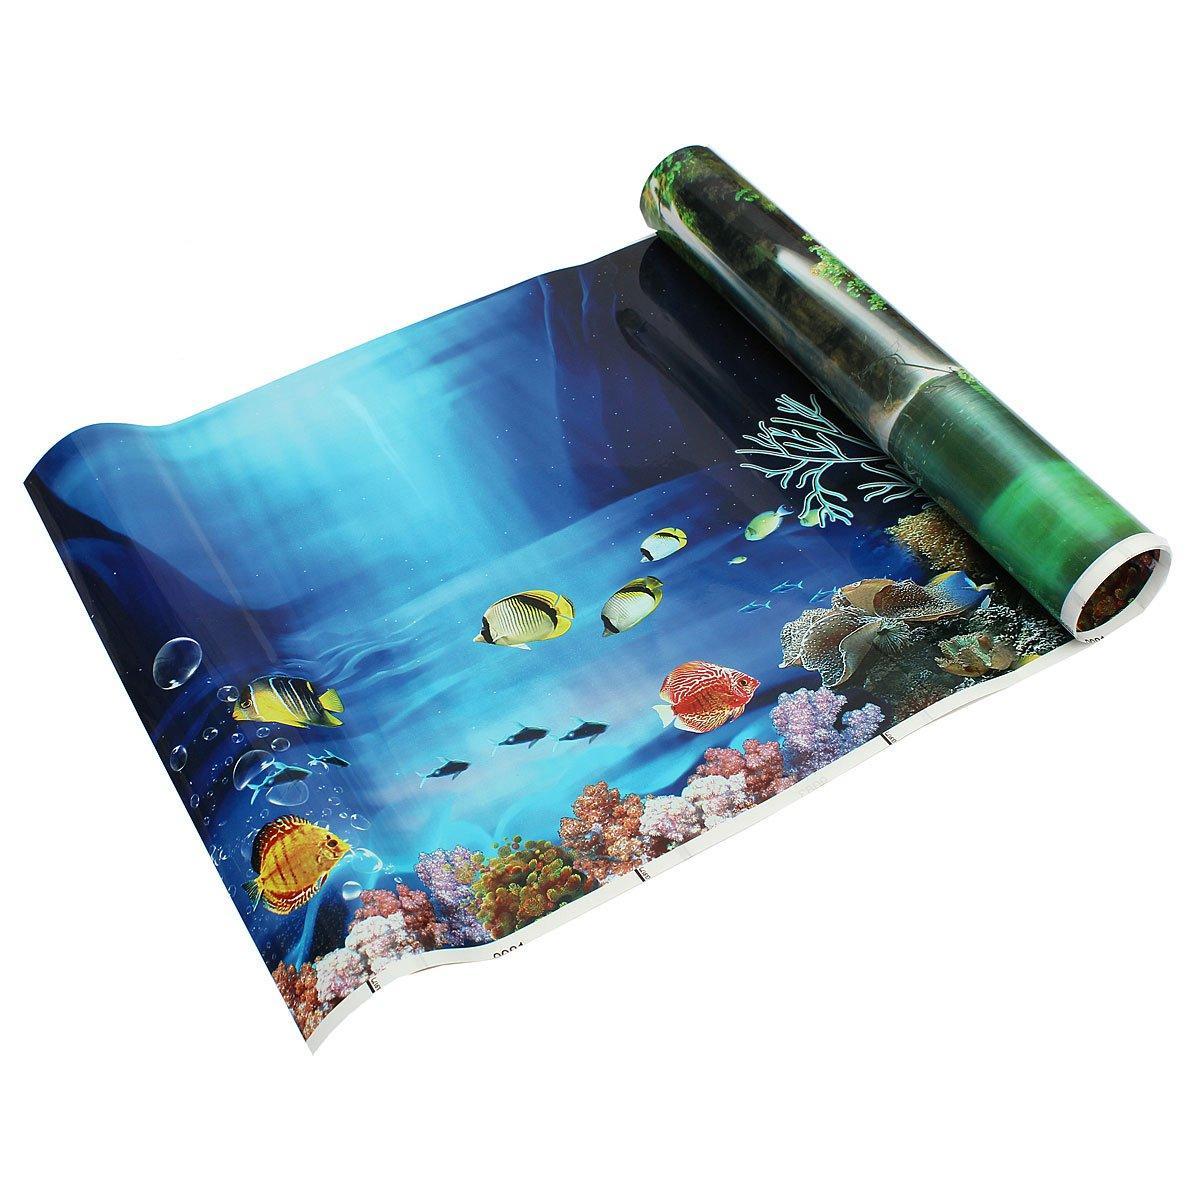 Download 920+ Background Aquarium Polos Hitam HD Terbaik